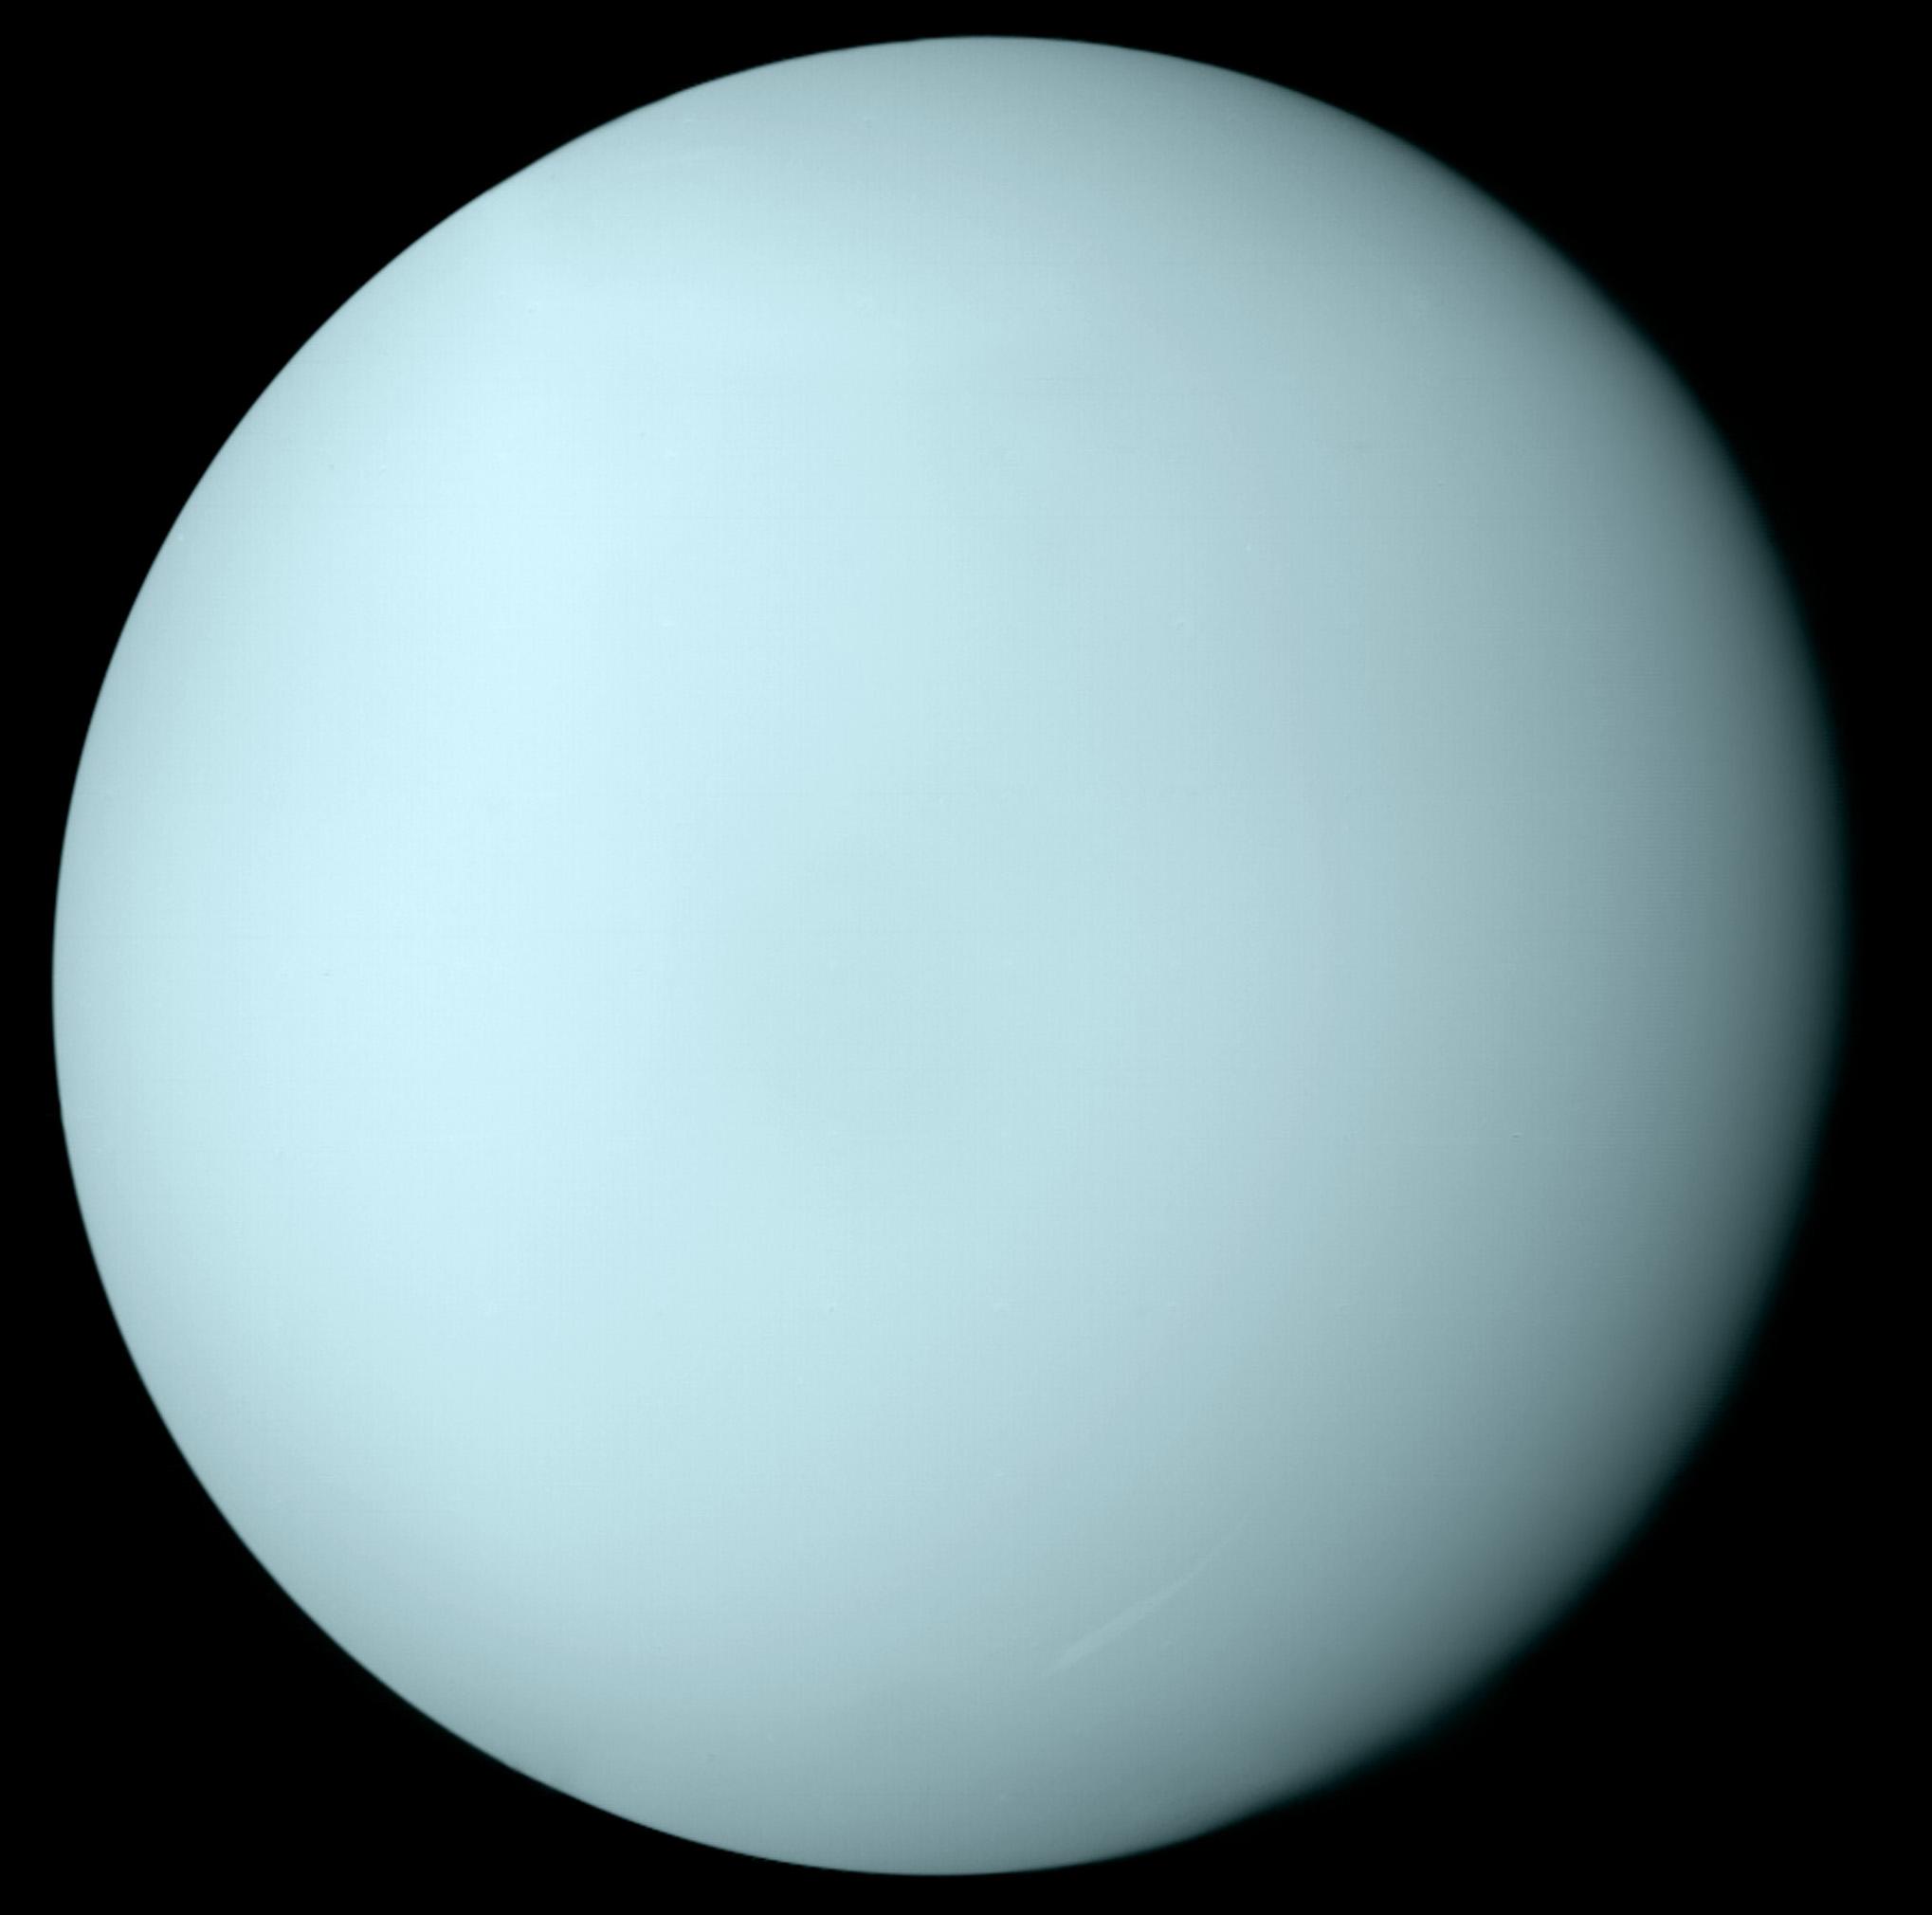 Iphone Wallpaper Icon Template Uranus 2 Userlogos Org